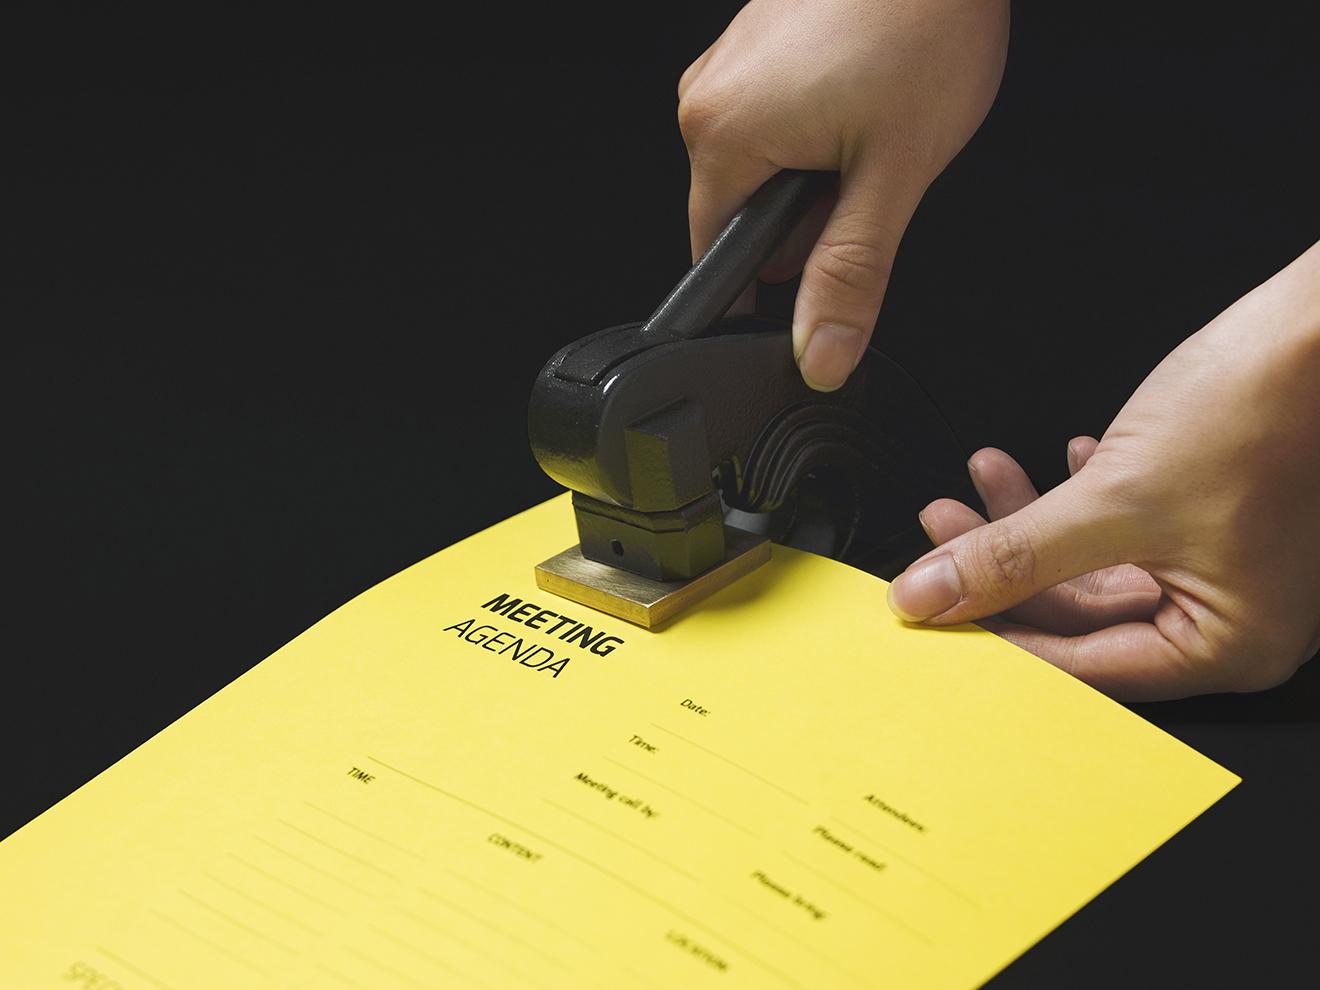 embosser stamp-stationary gbox